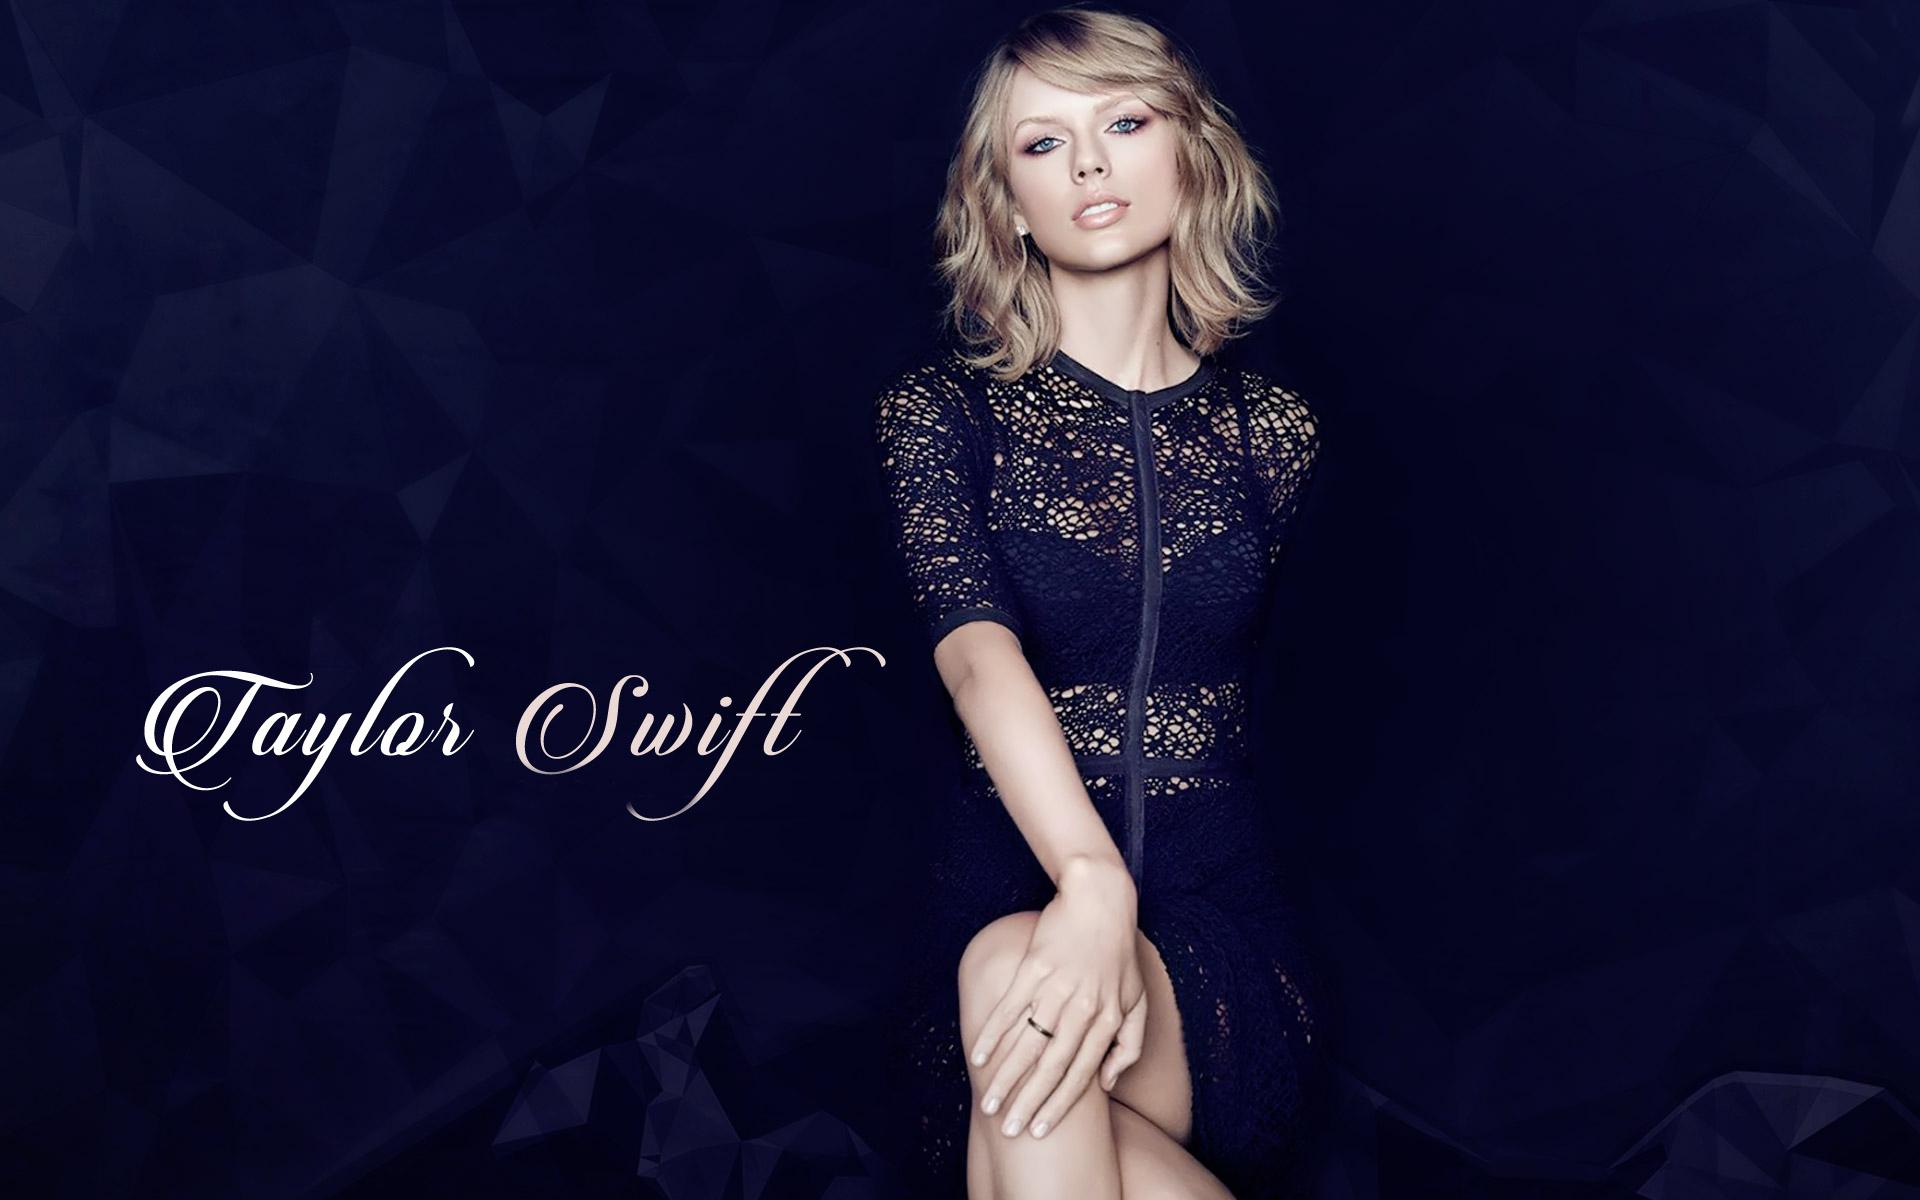 Taylor Swift Wallpaper 2015